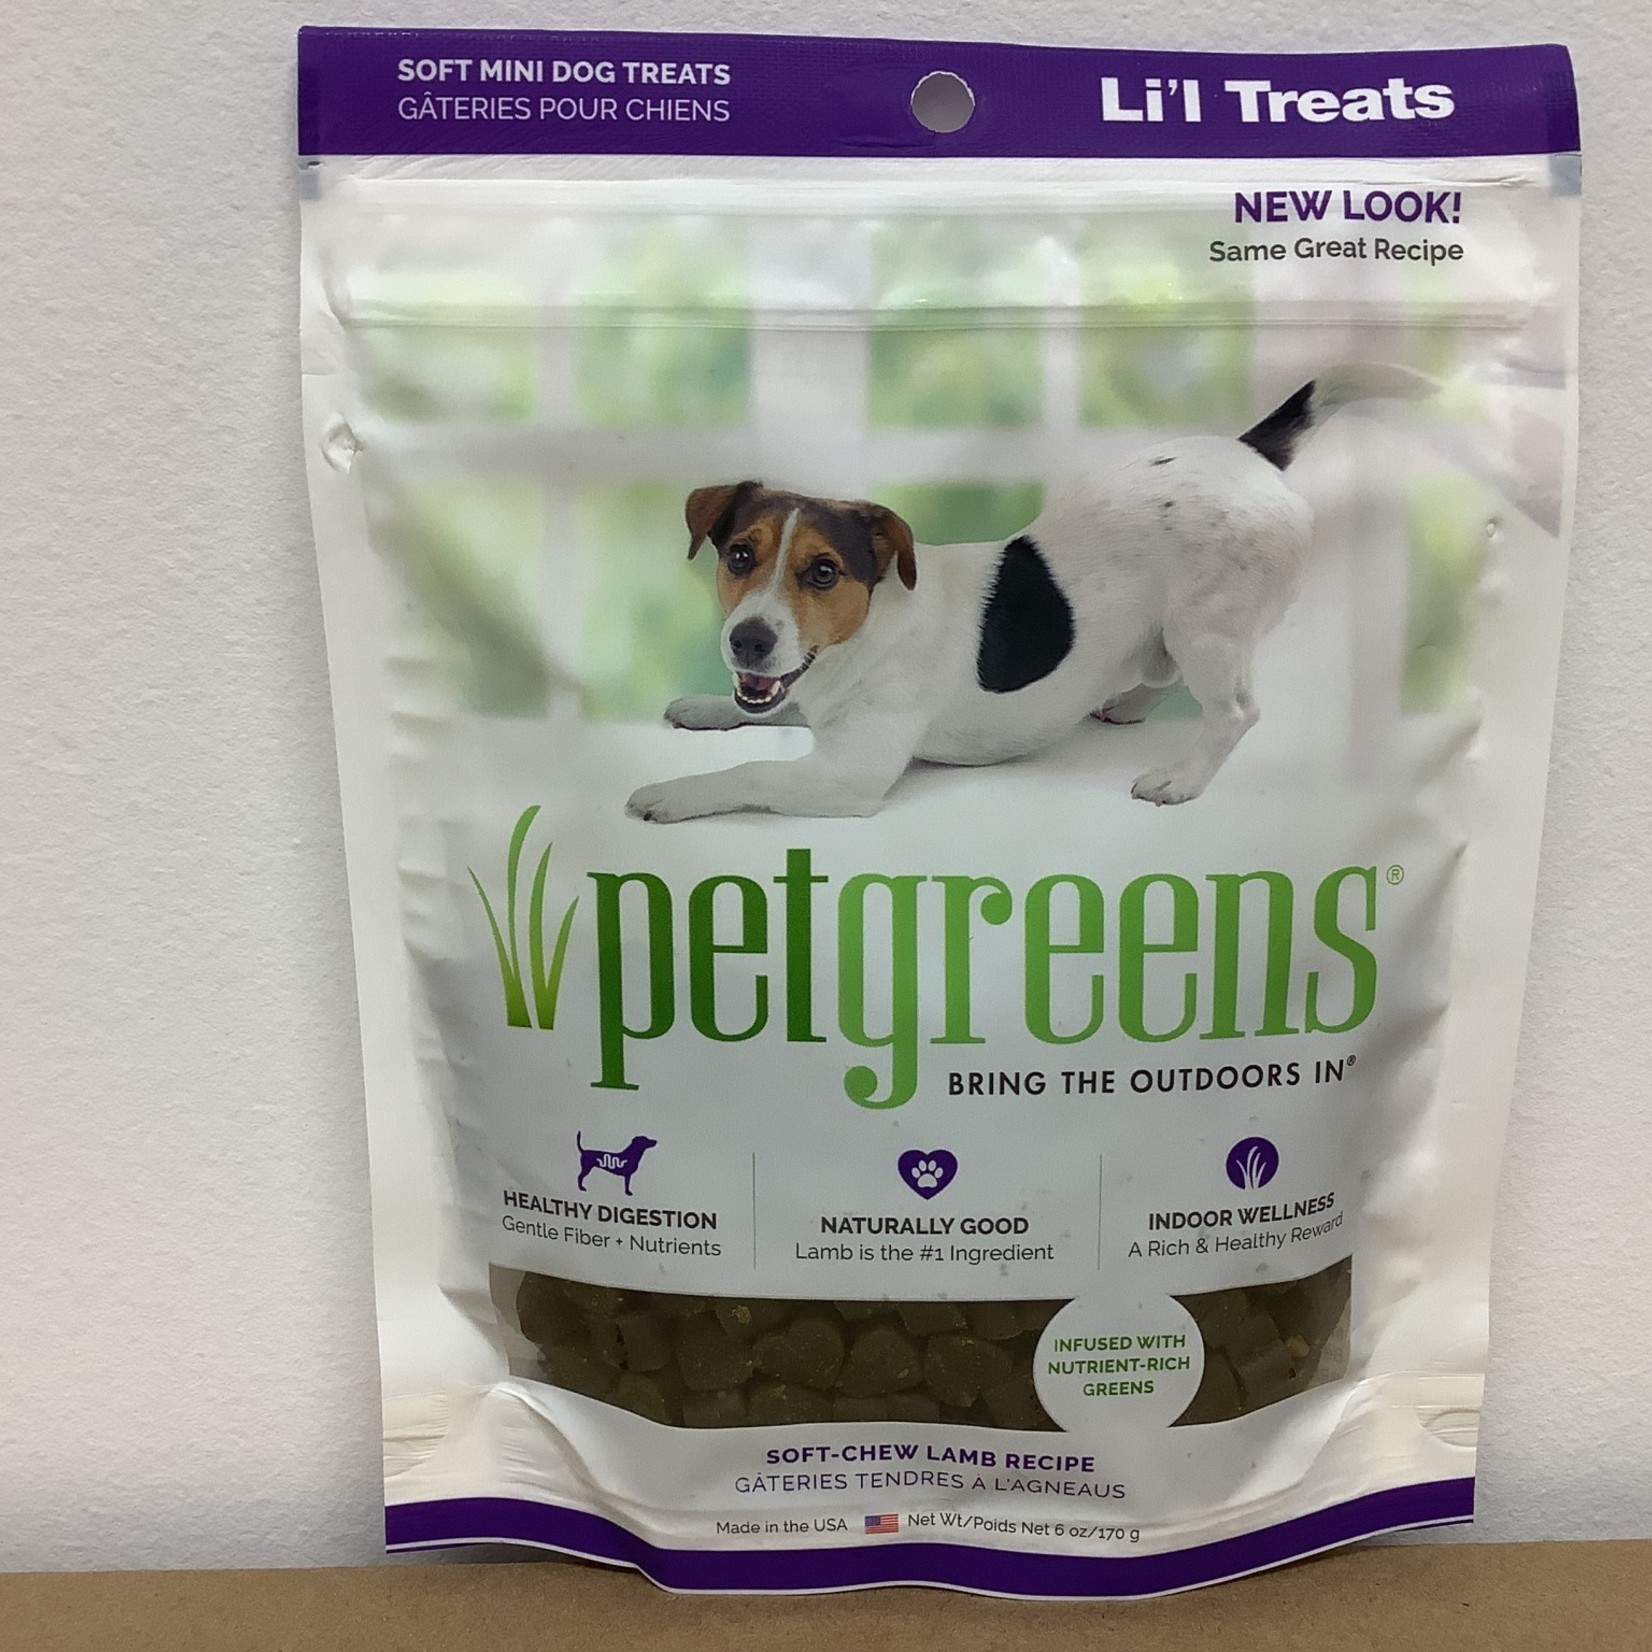 BellRock 4 saveurs de Gâteries molles à mâcher-170 g-chien PetGreens